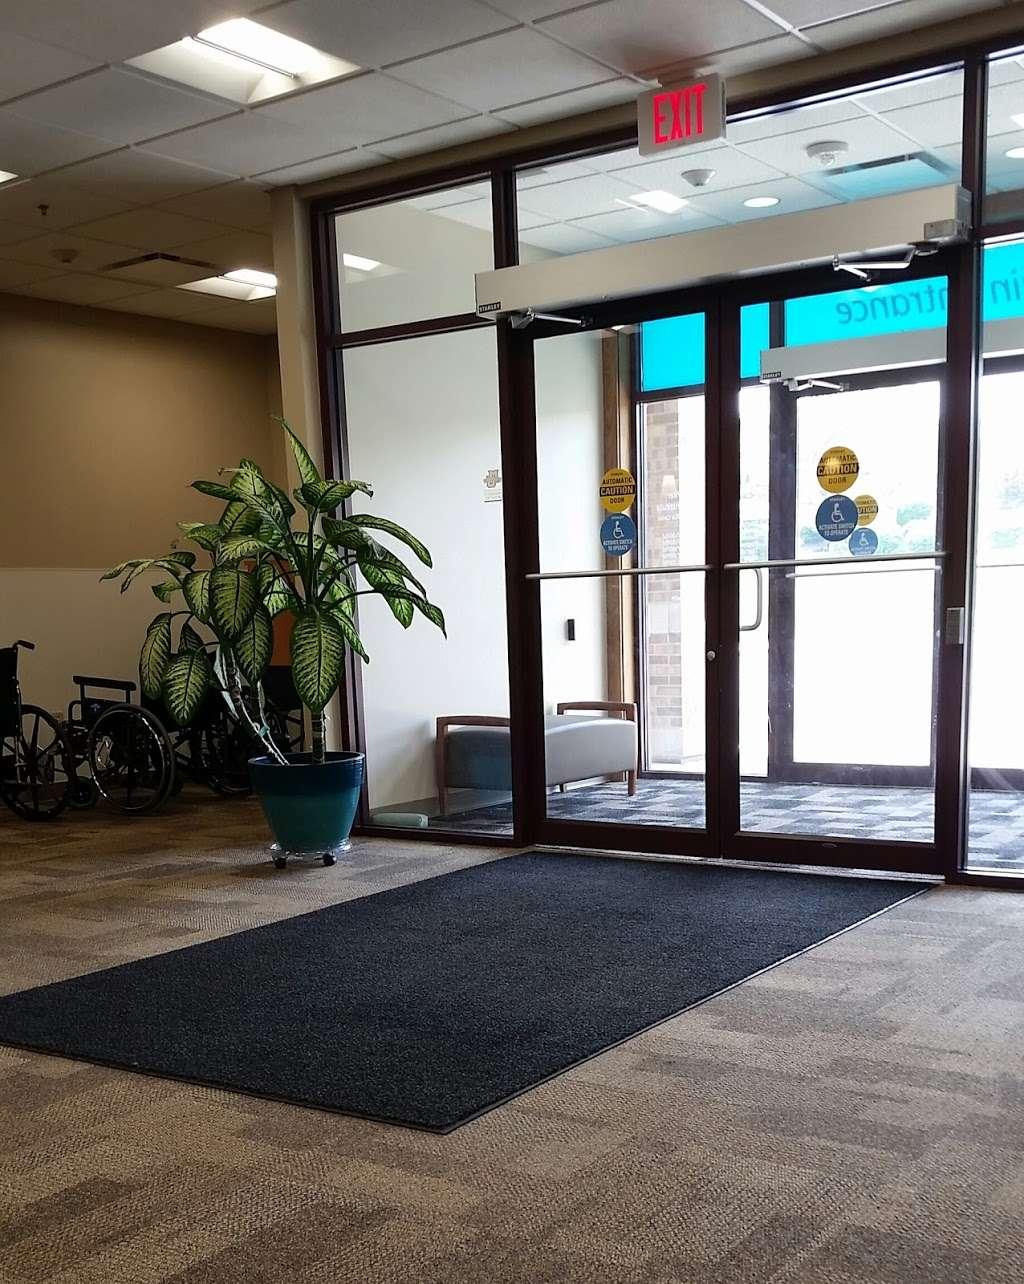 Aurora Sports Medicine Rehab Clinic - doctor  | Photo 2 of 2 | Address: 700 Geneva Pkwy N, Lake Geneva, WI 53147, USA | Phone: (262) 249-3500